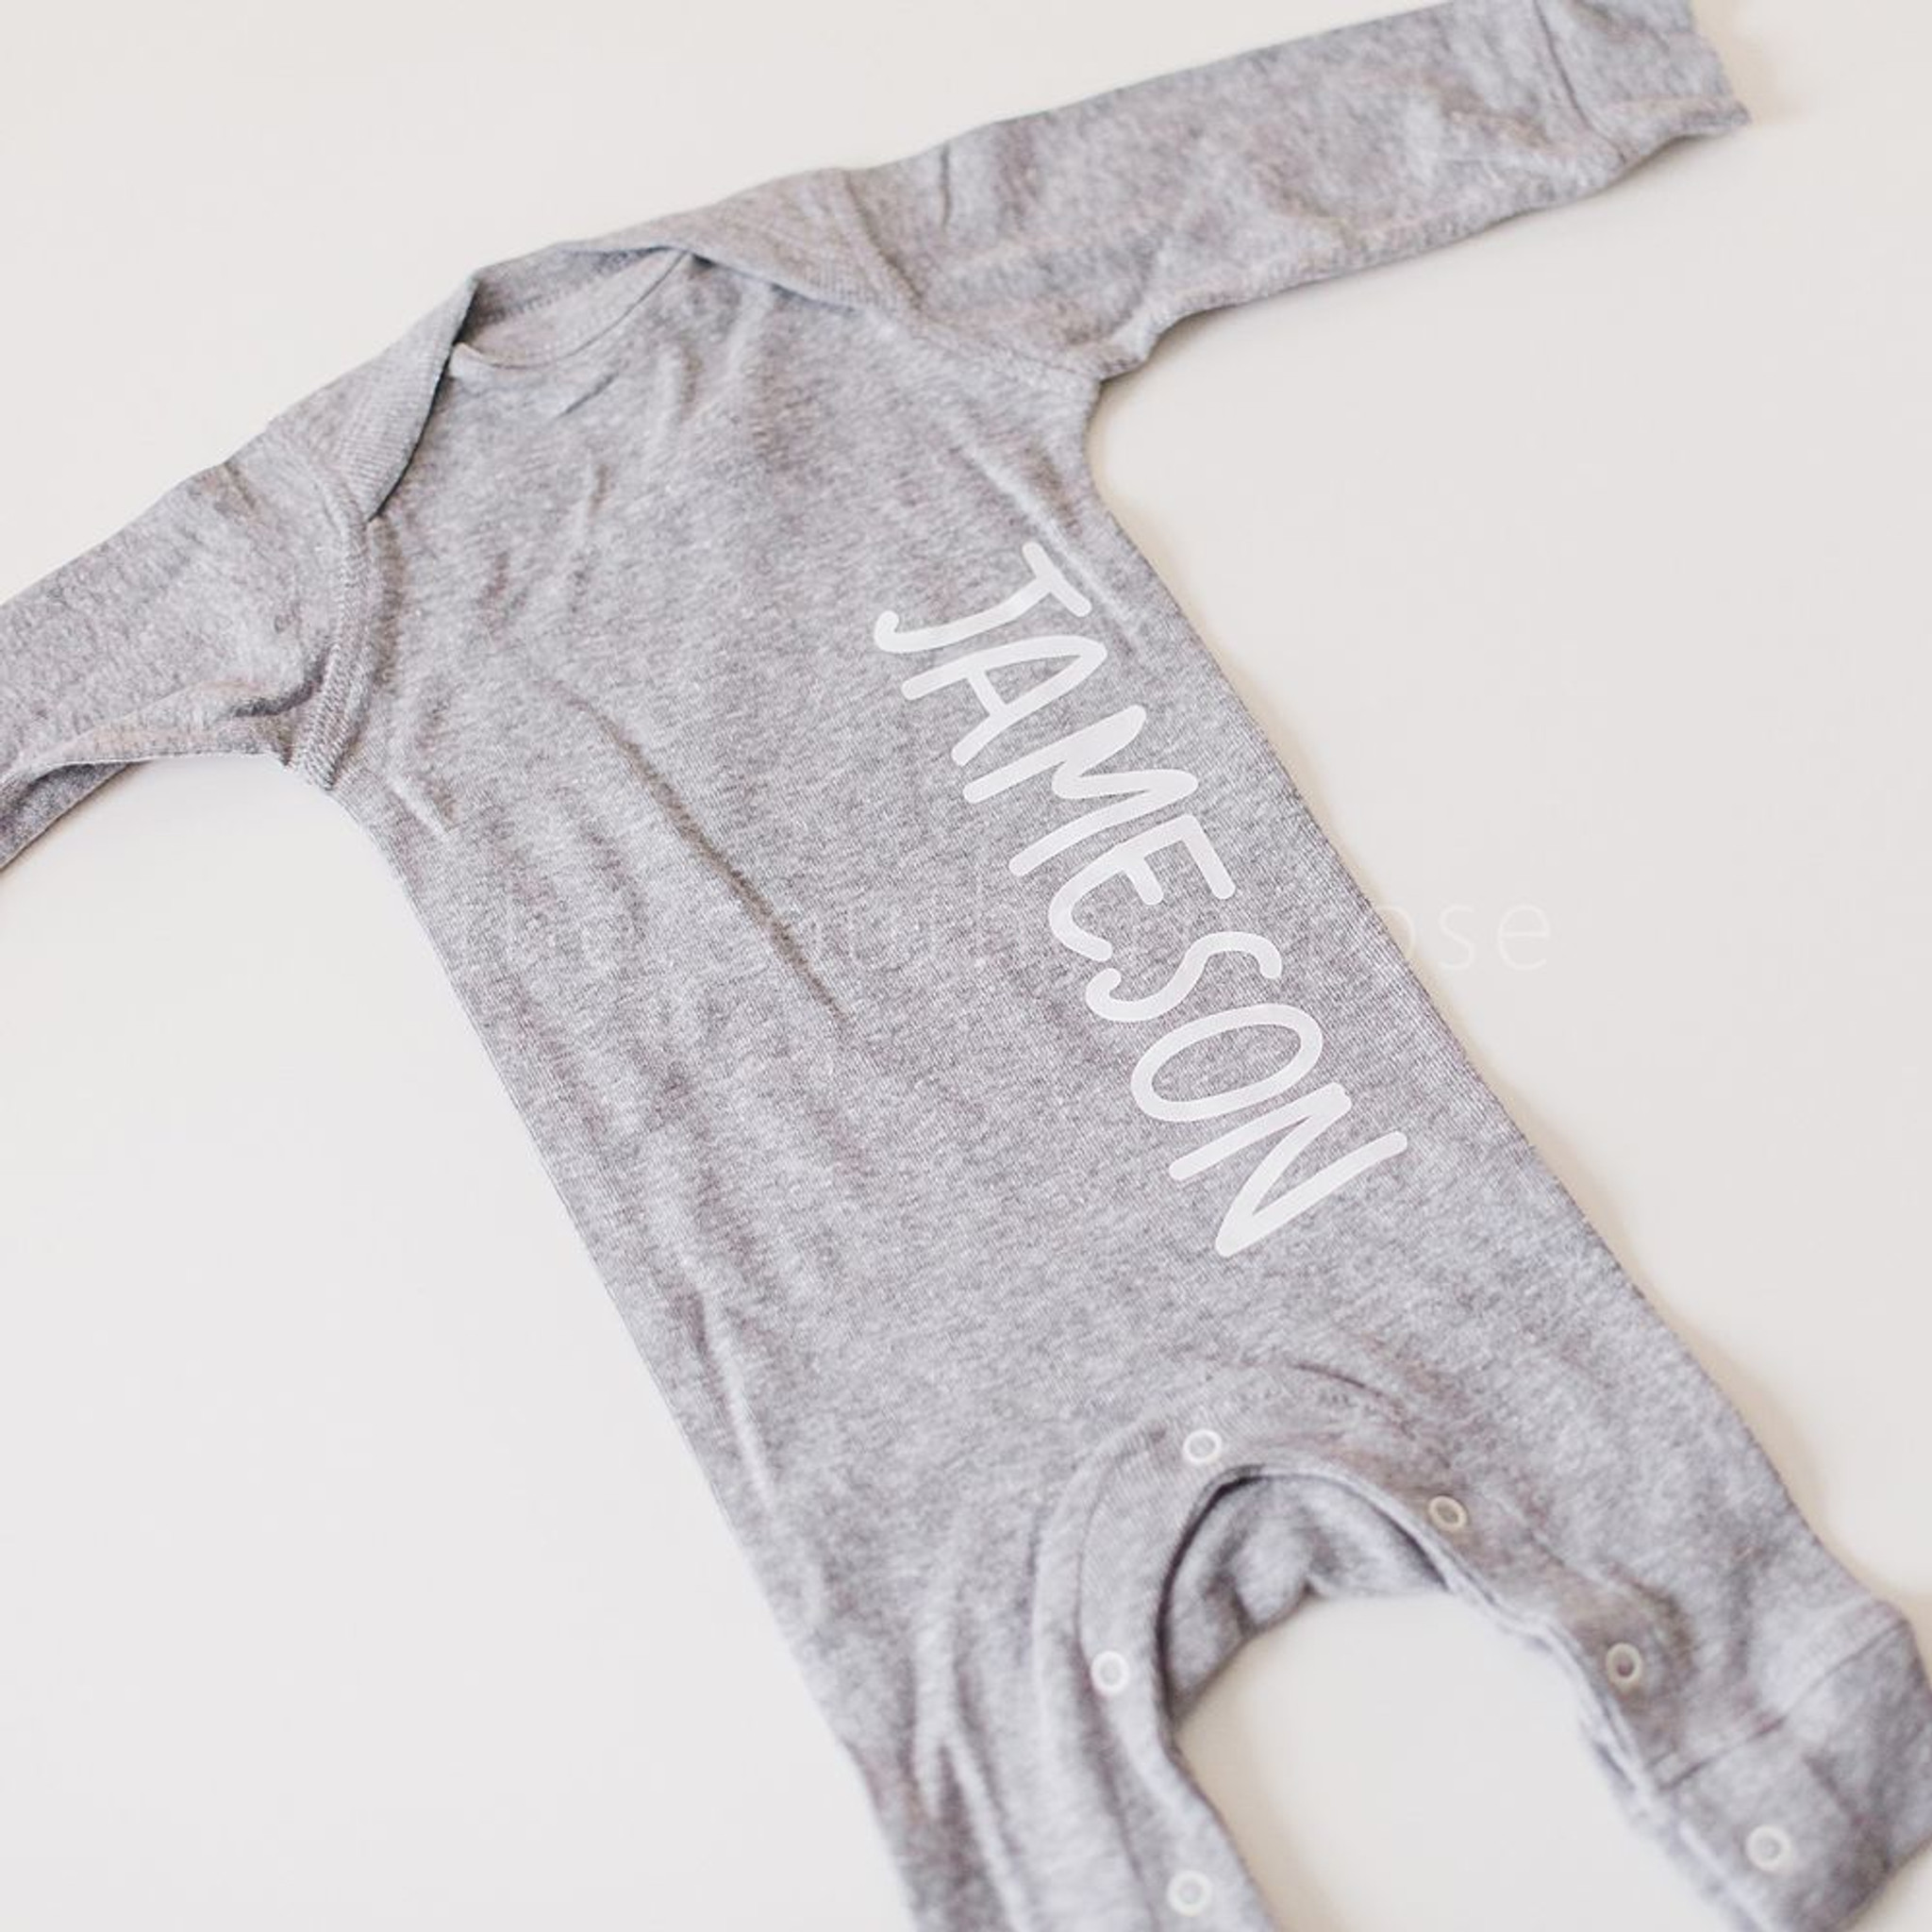 Personalized Infant Bodysuit